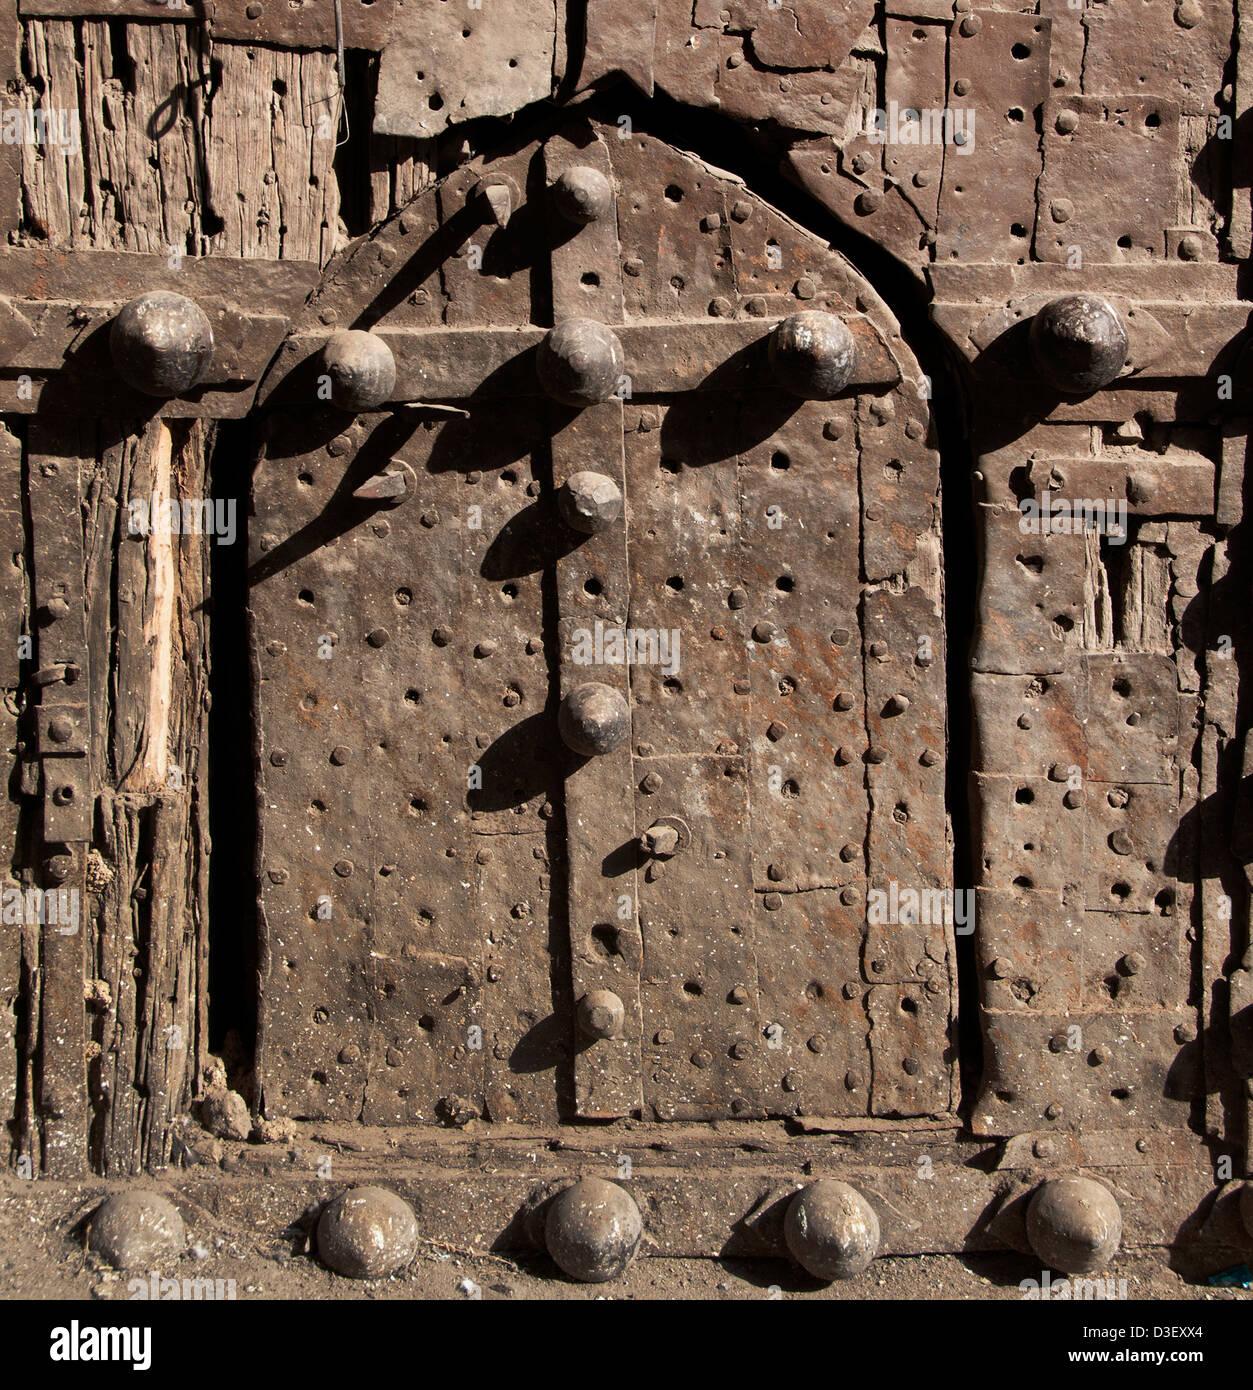 Golkonda Fort ruined city capital of ancient Kingdom of Golkonda 1518–1687 Hyderabad India Andhra Pradesh - Stock Image